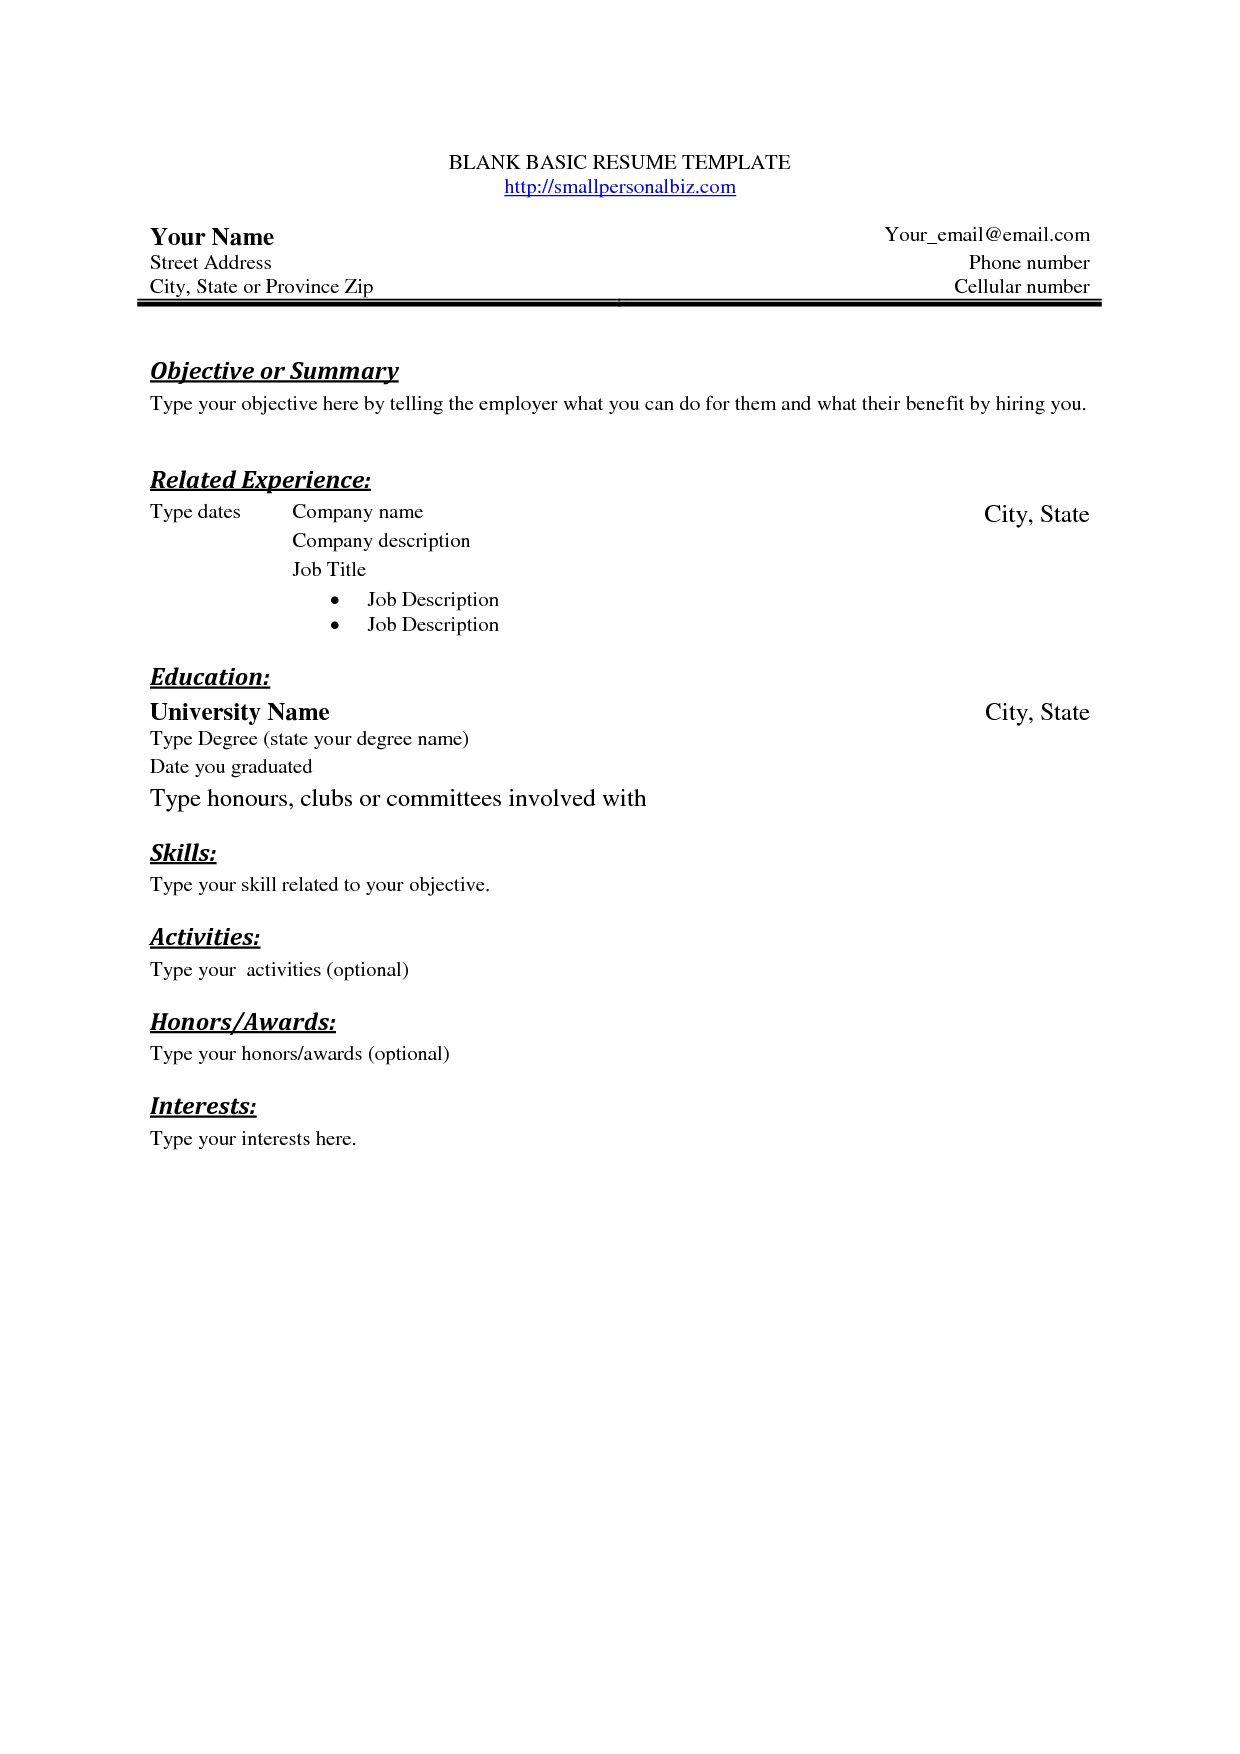 Simple Resume Template Free Addictionary